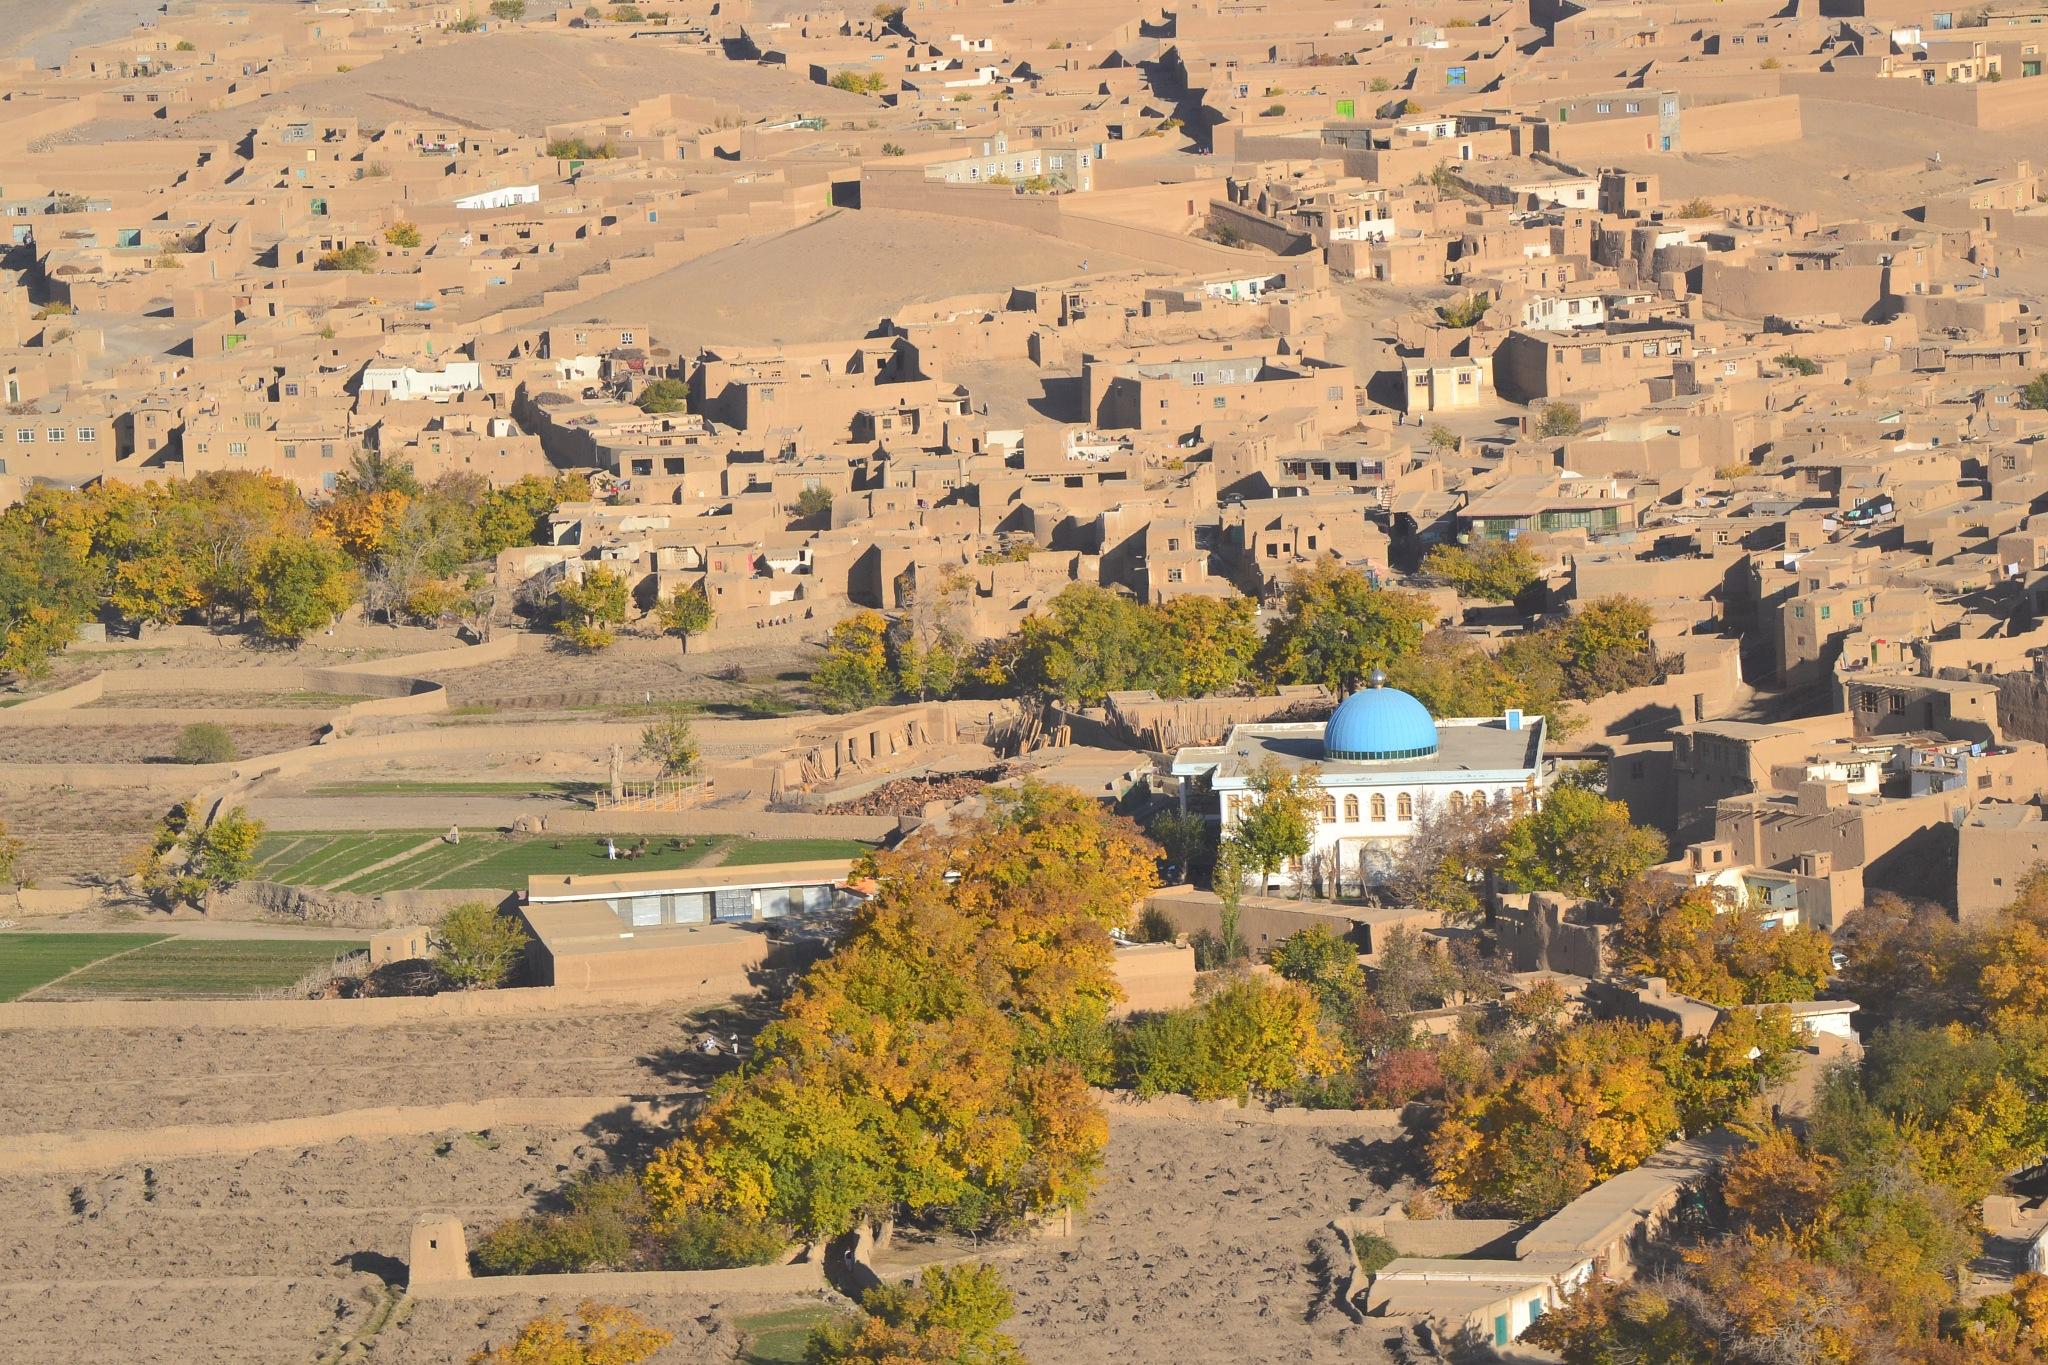 Afghan Village by Brian Delfin